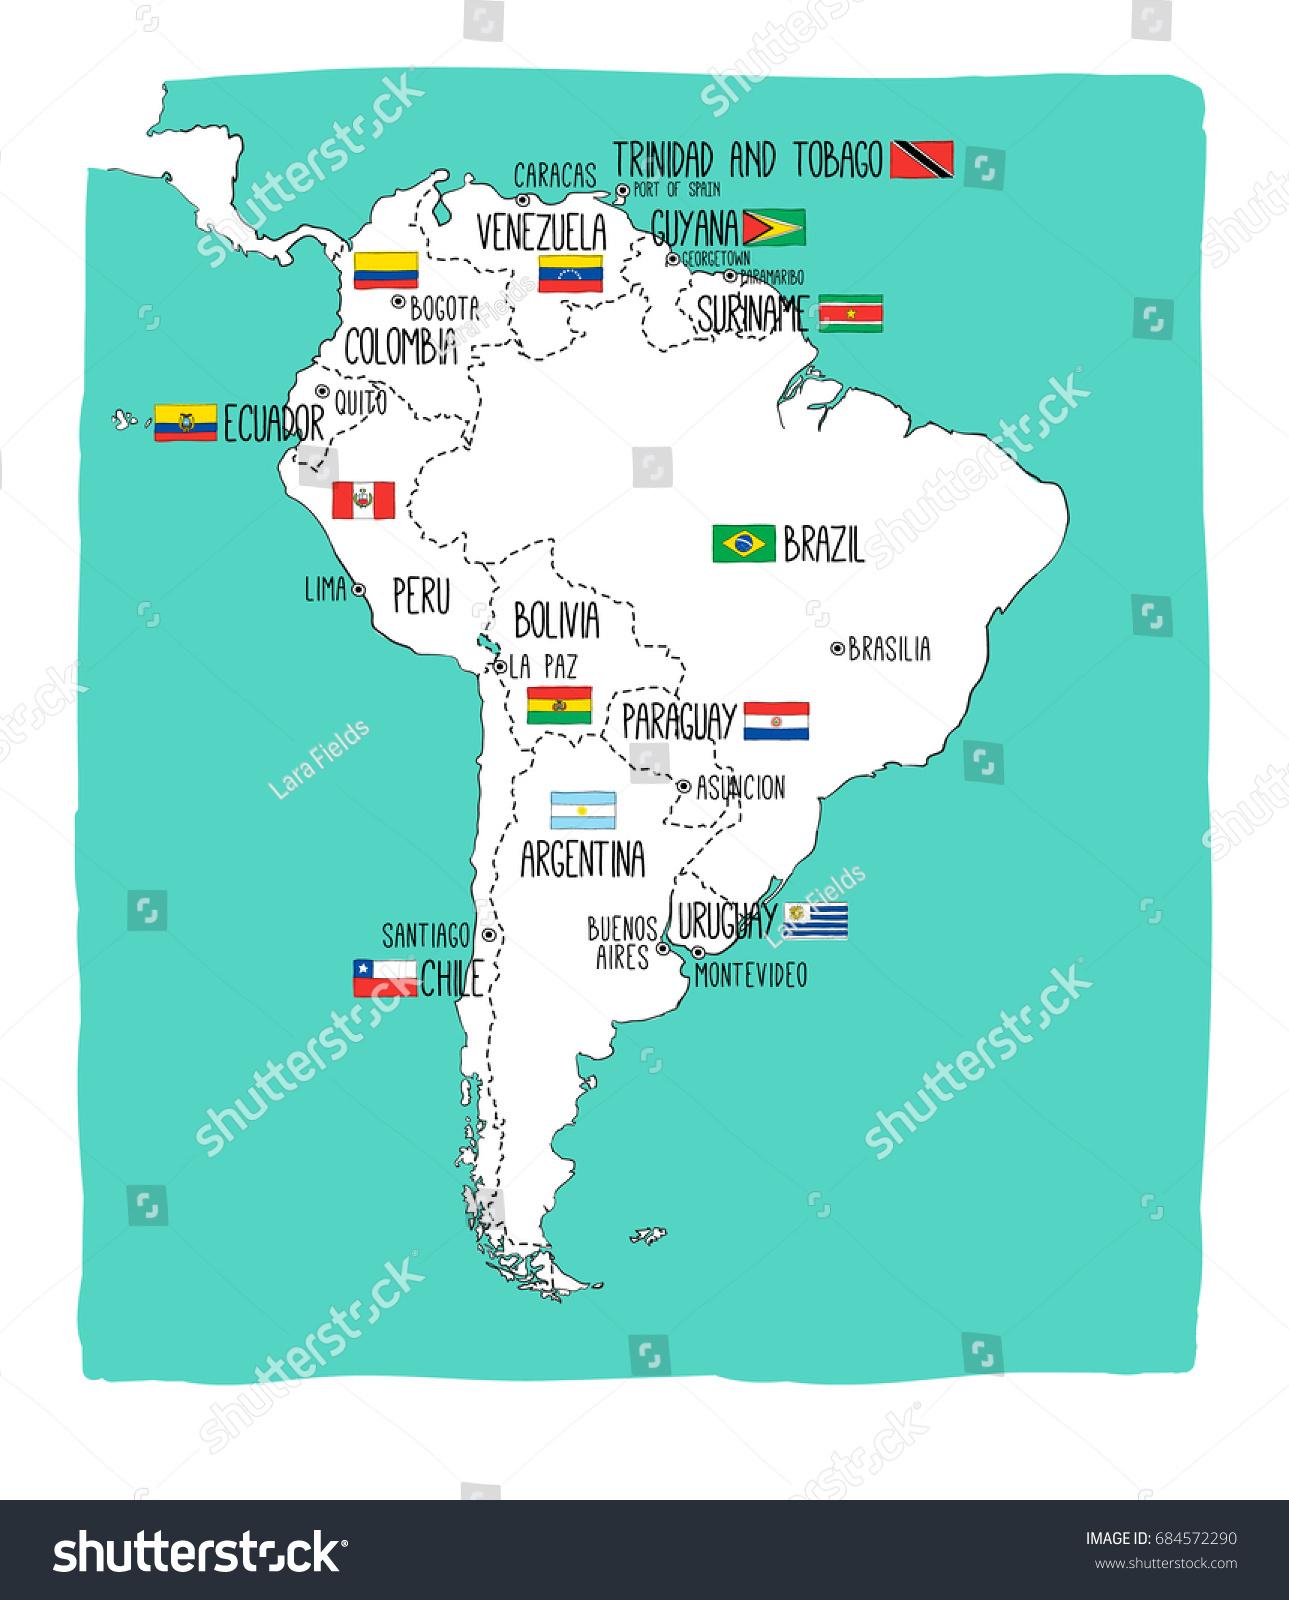 Hand Drawn Vector Map South America Stock Vector - Map of ecuador south america